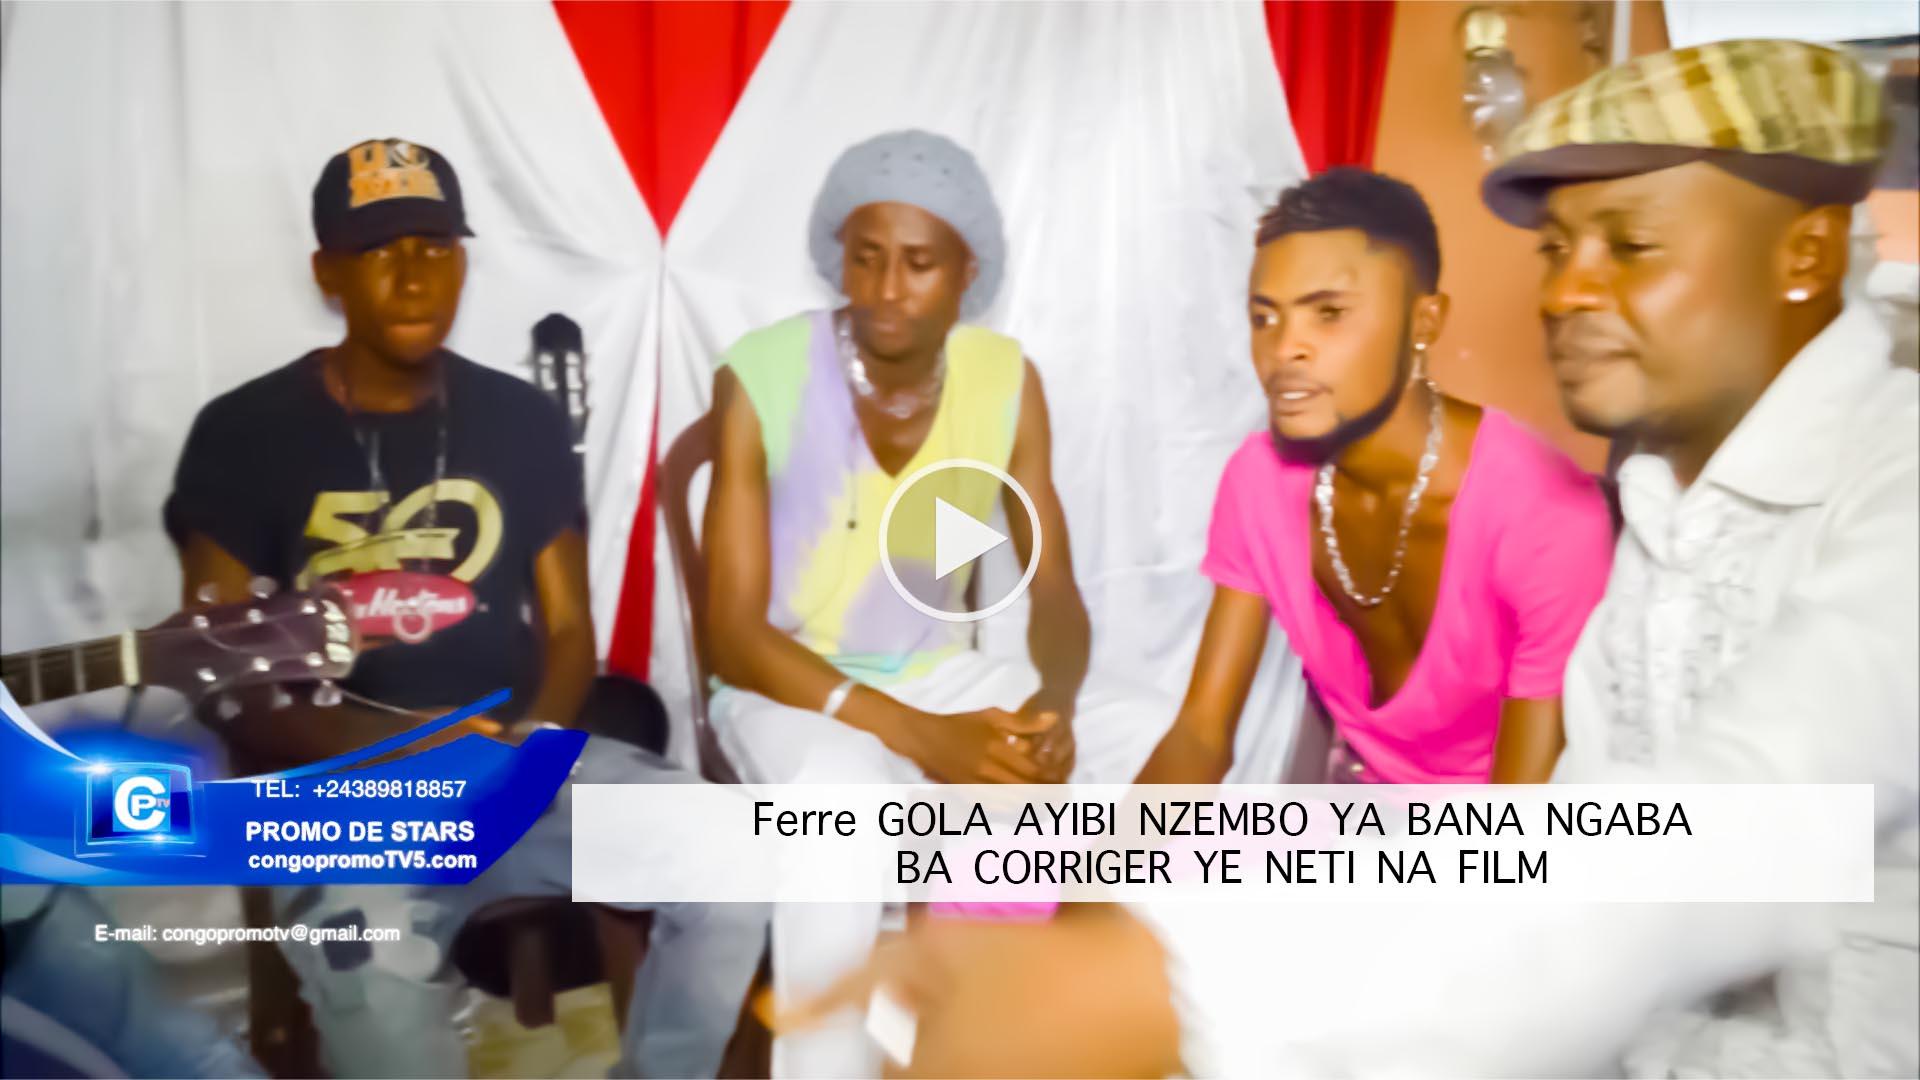 Ferré GOLA ayibaki nzembo ya bana Ngaba baye ko corriger ye neti na Film avec le leader de mingongo suivez...